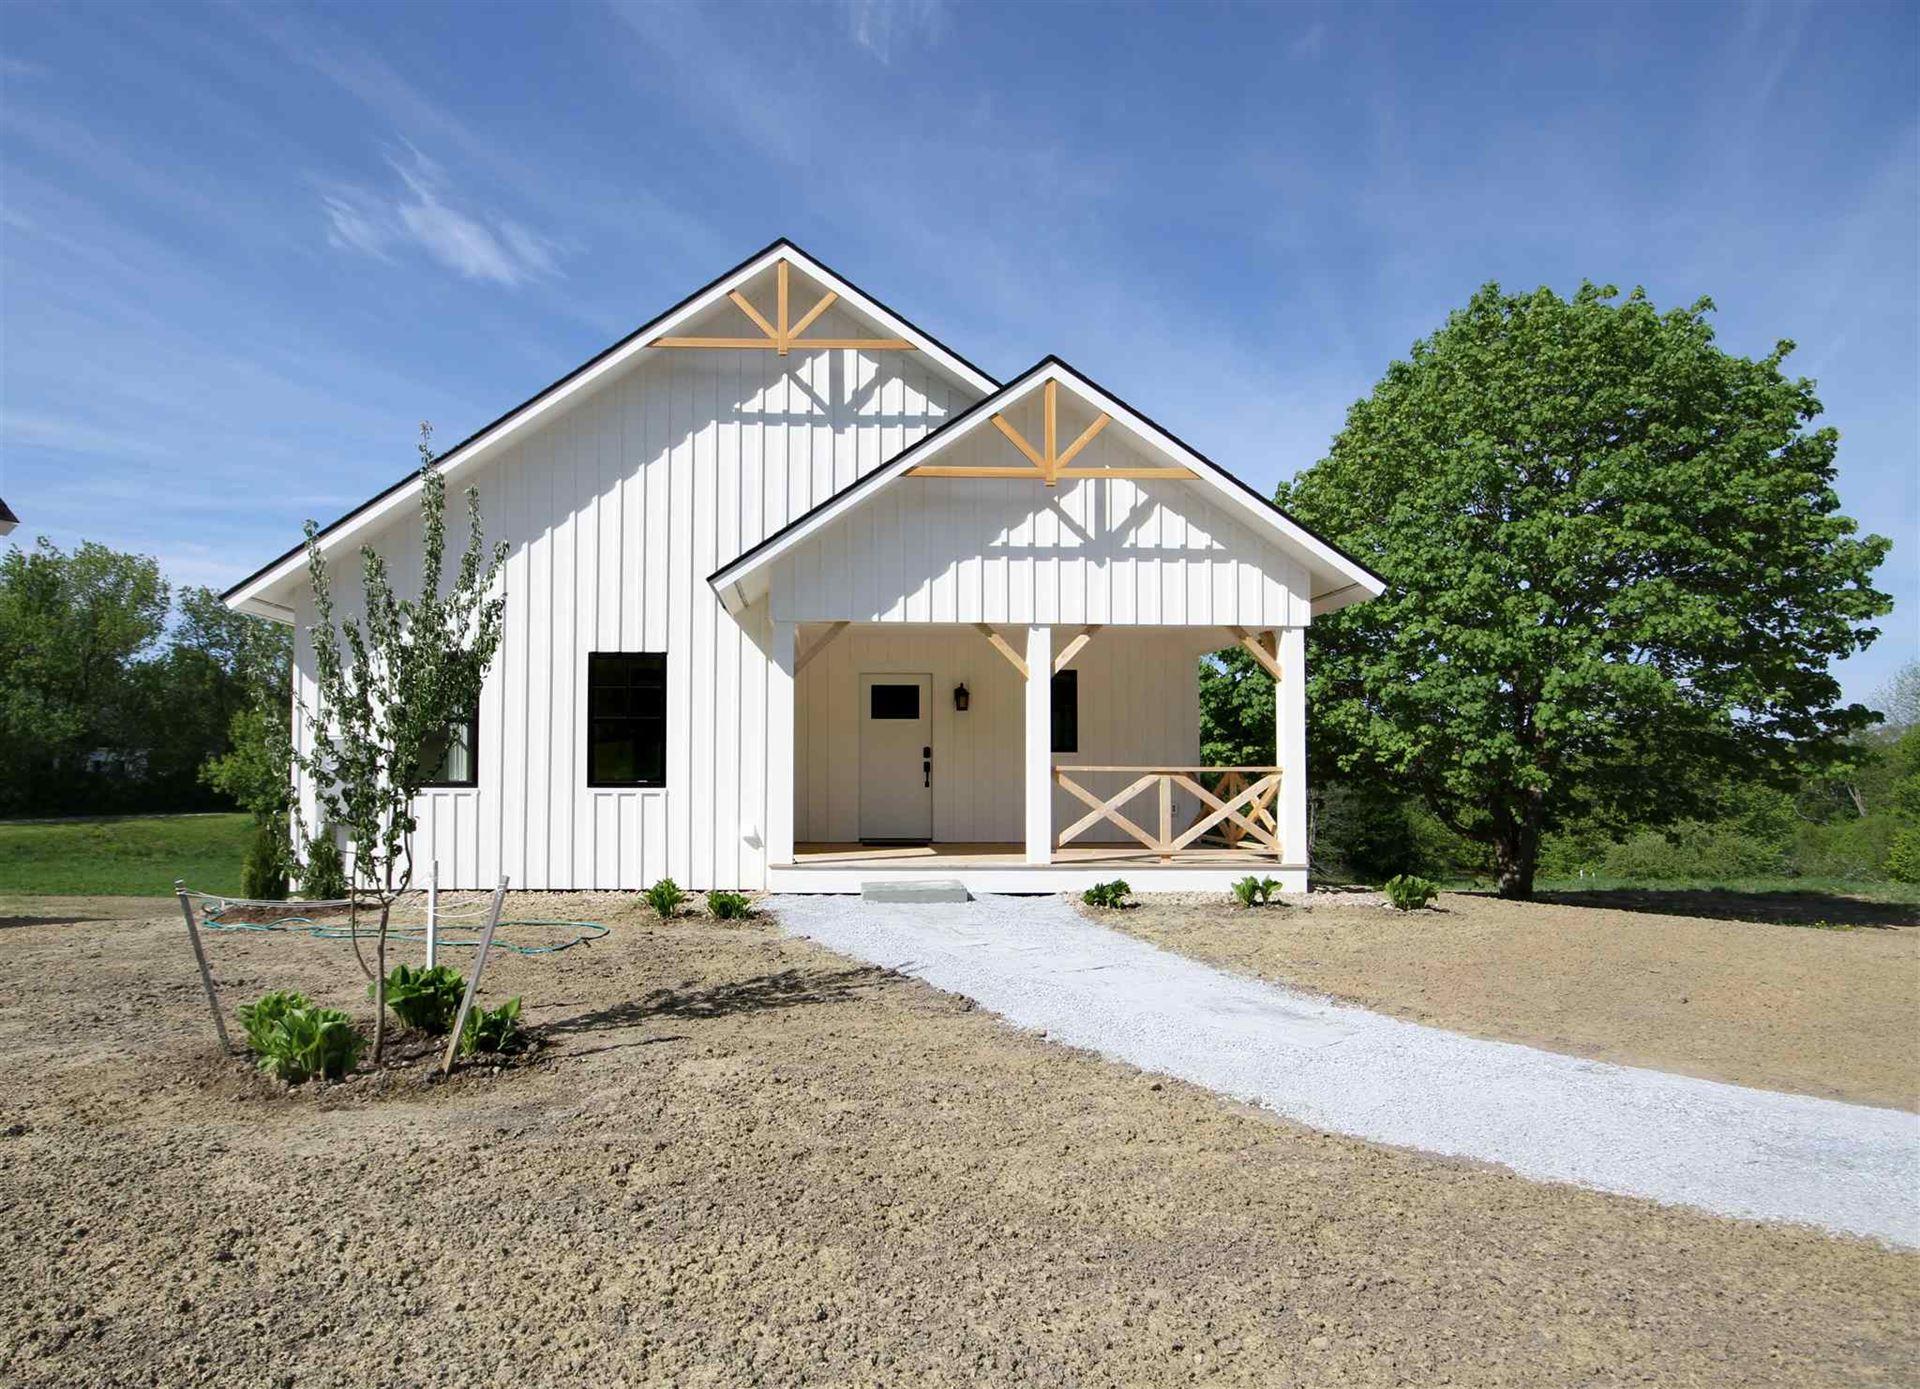 19 Cottage Park #19, Bristol, VT 05443 - MLS#: 4807424